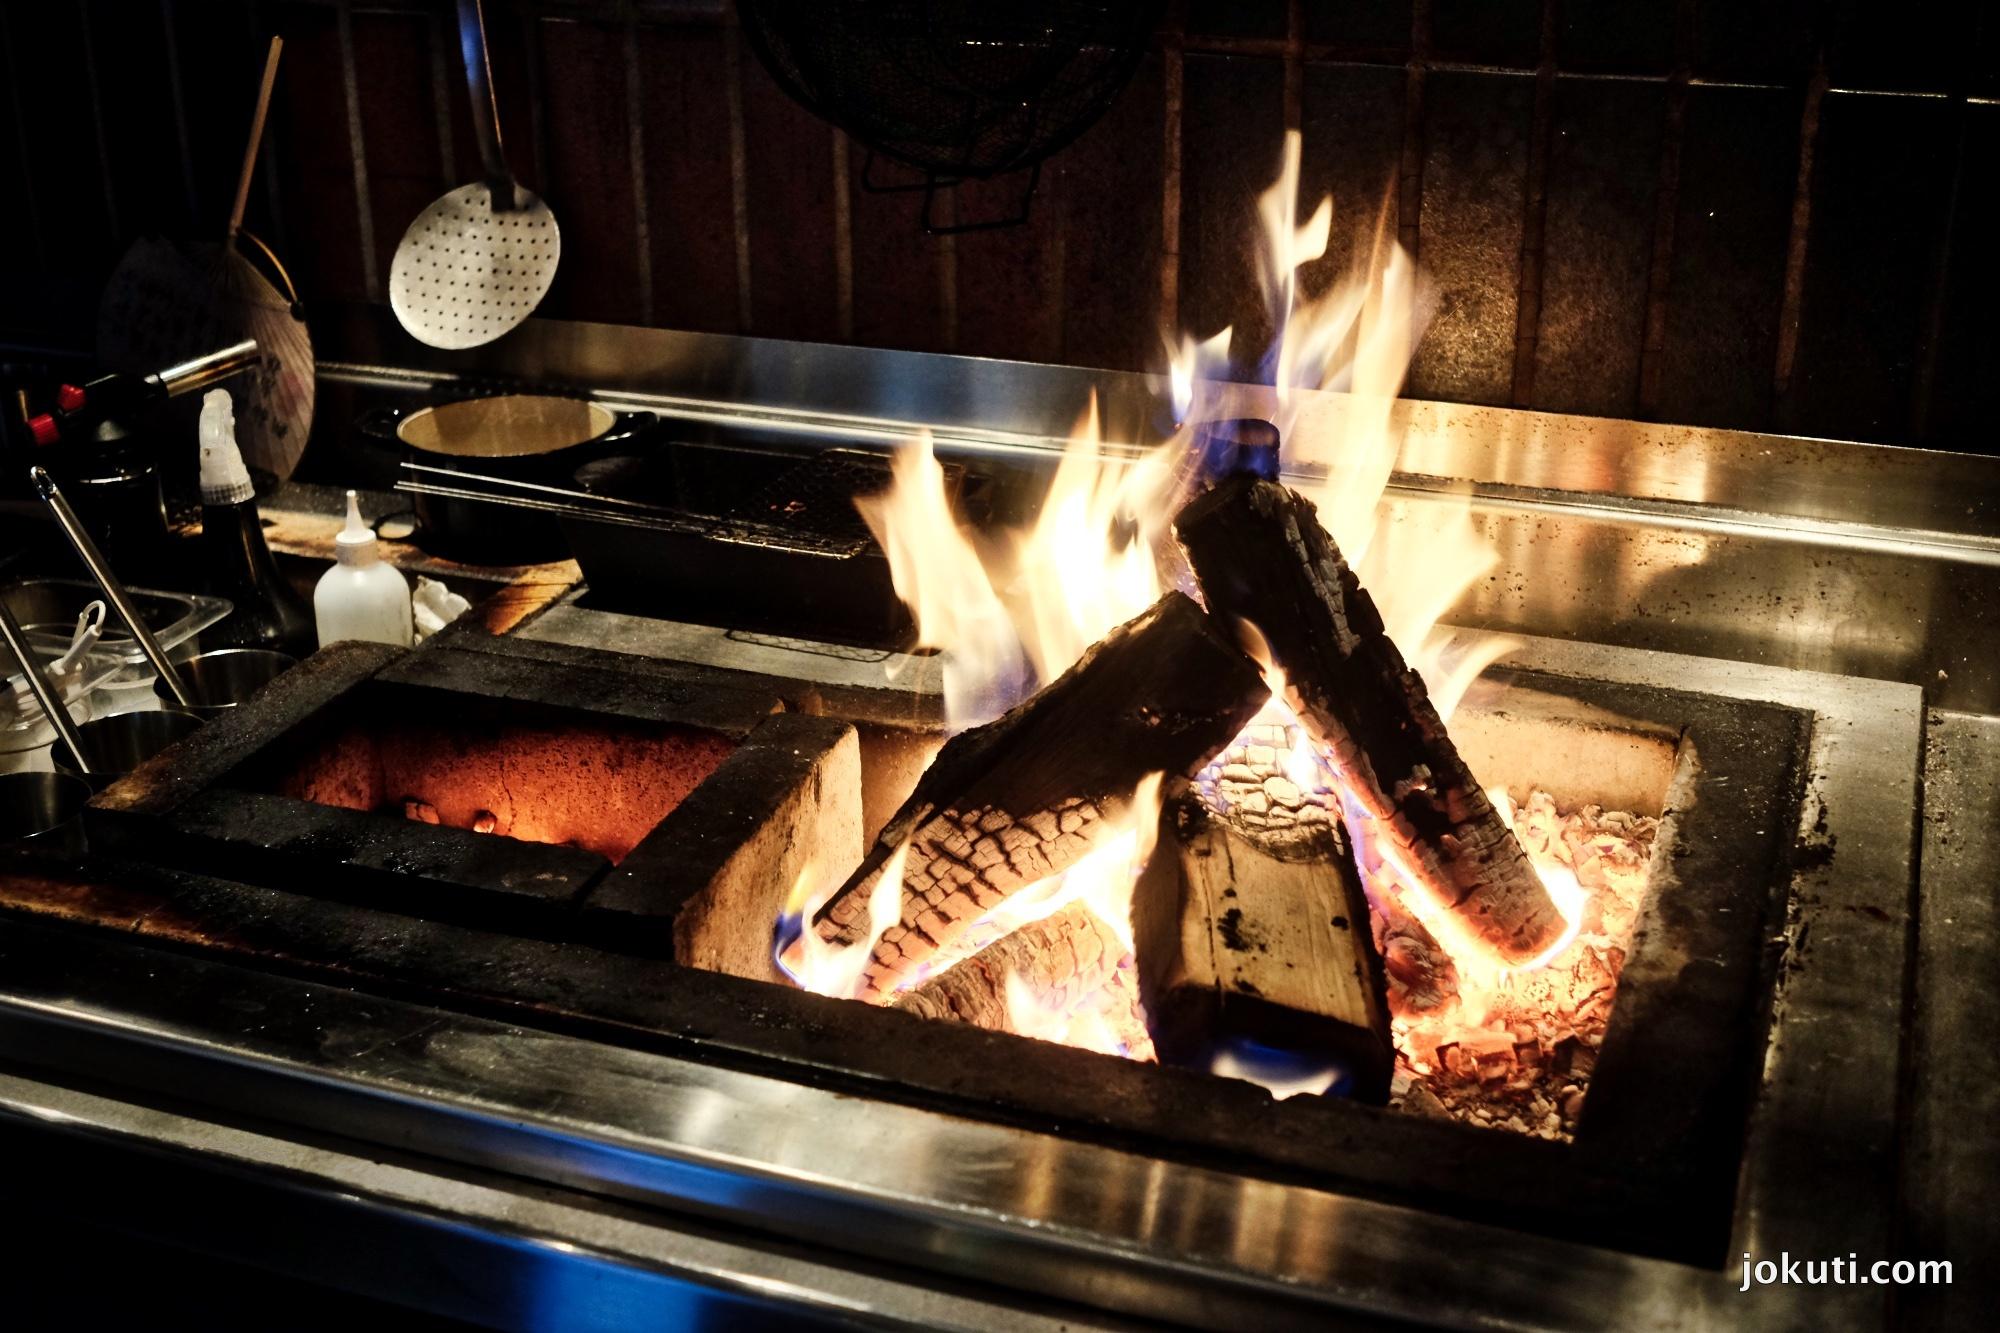 dscf5491_frantzen_stockholm_restaurant_michelin_stars_sweden_vilagevo_jokuti_l.jpg